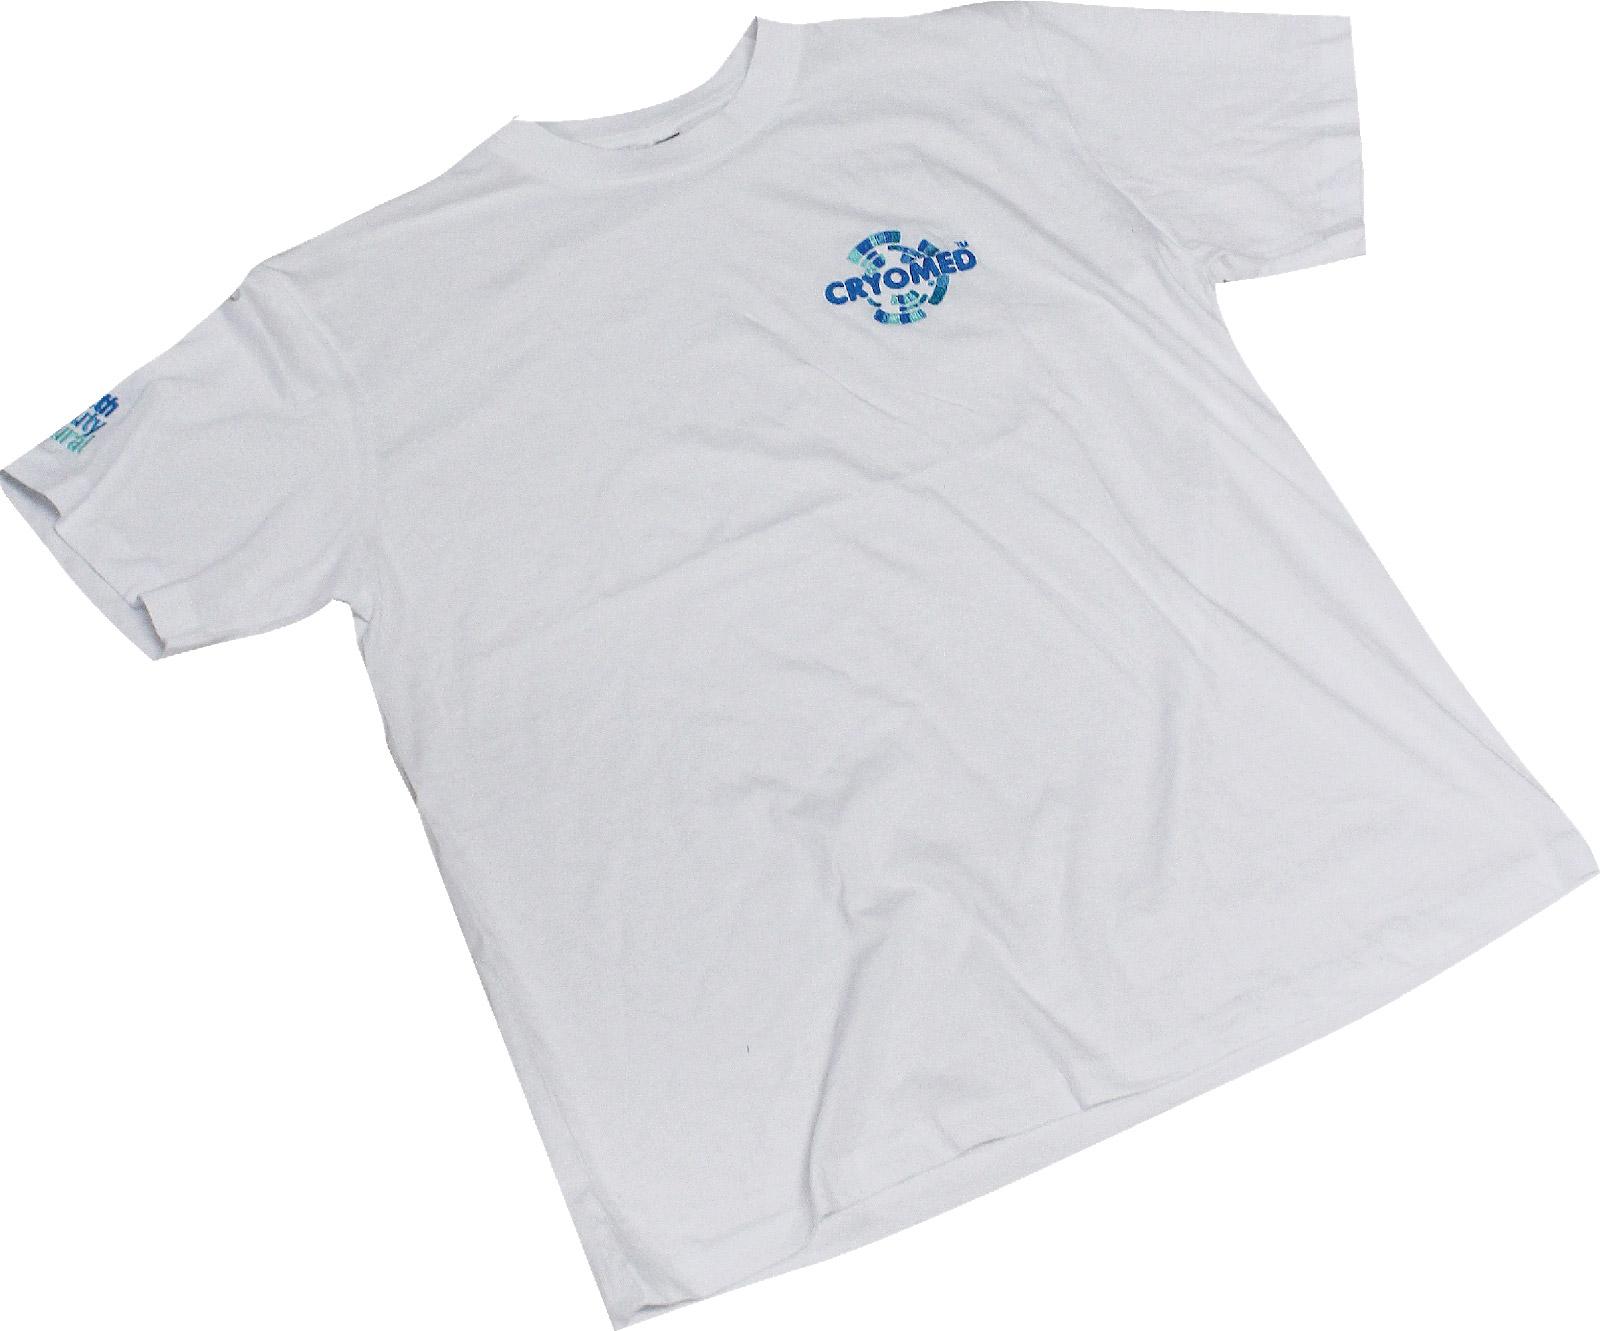 T-skjorte herre – 20 euro